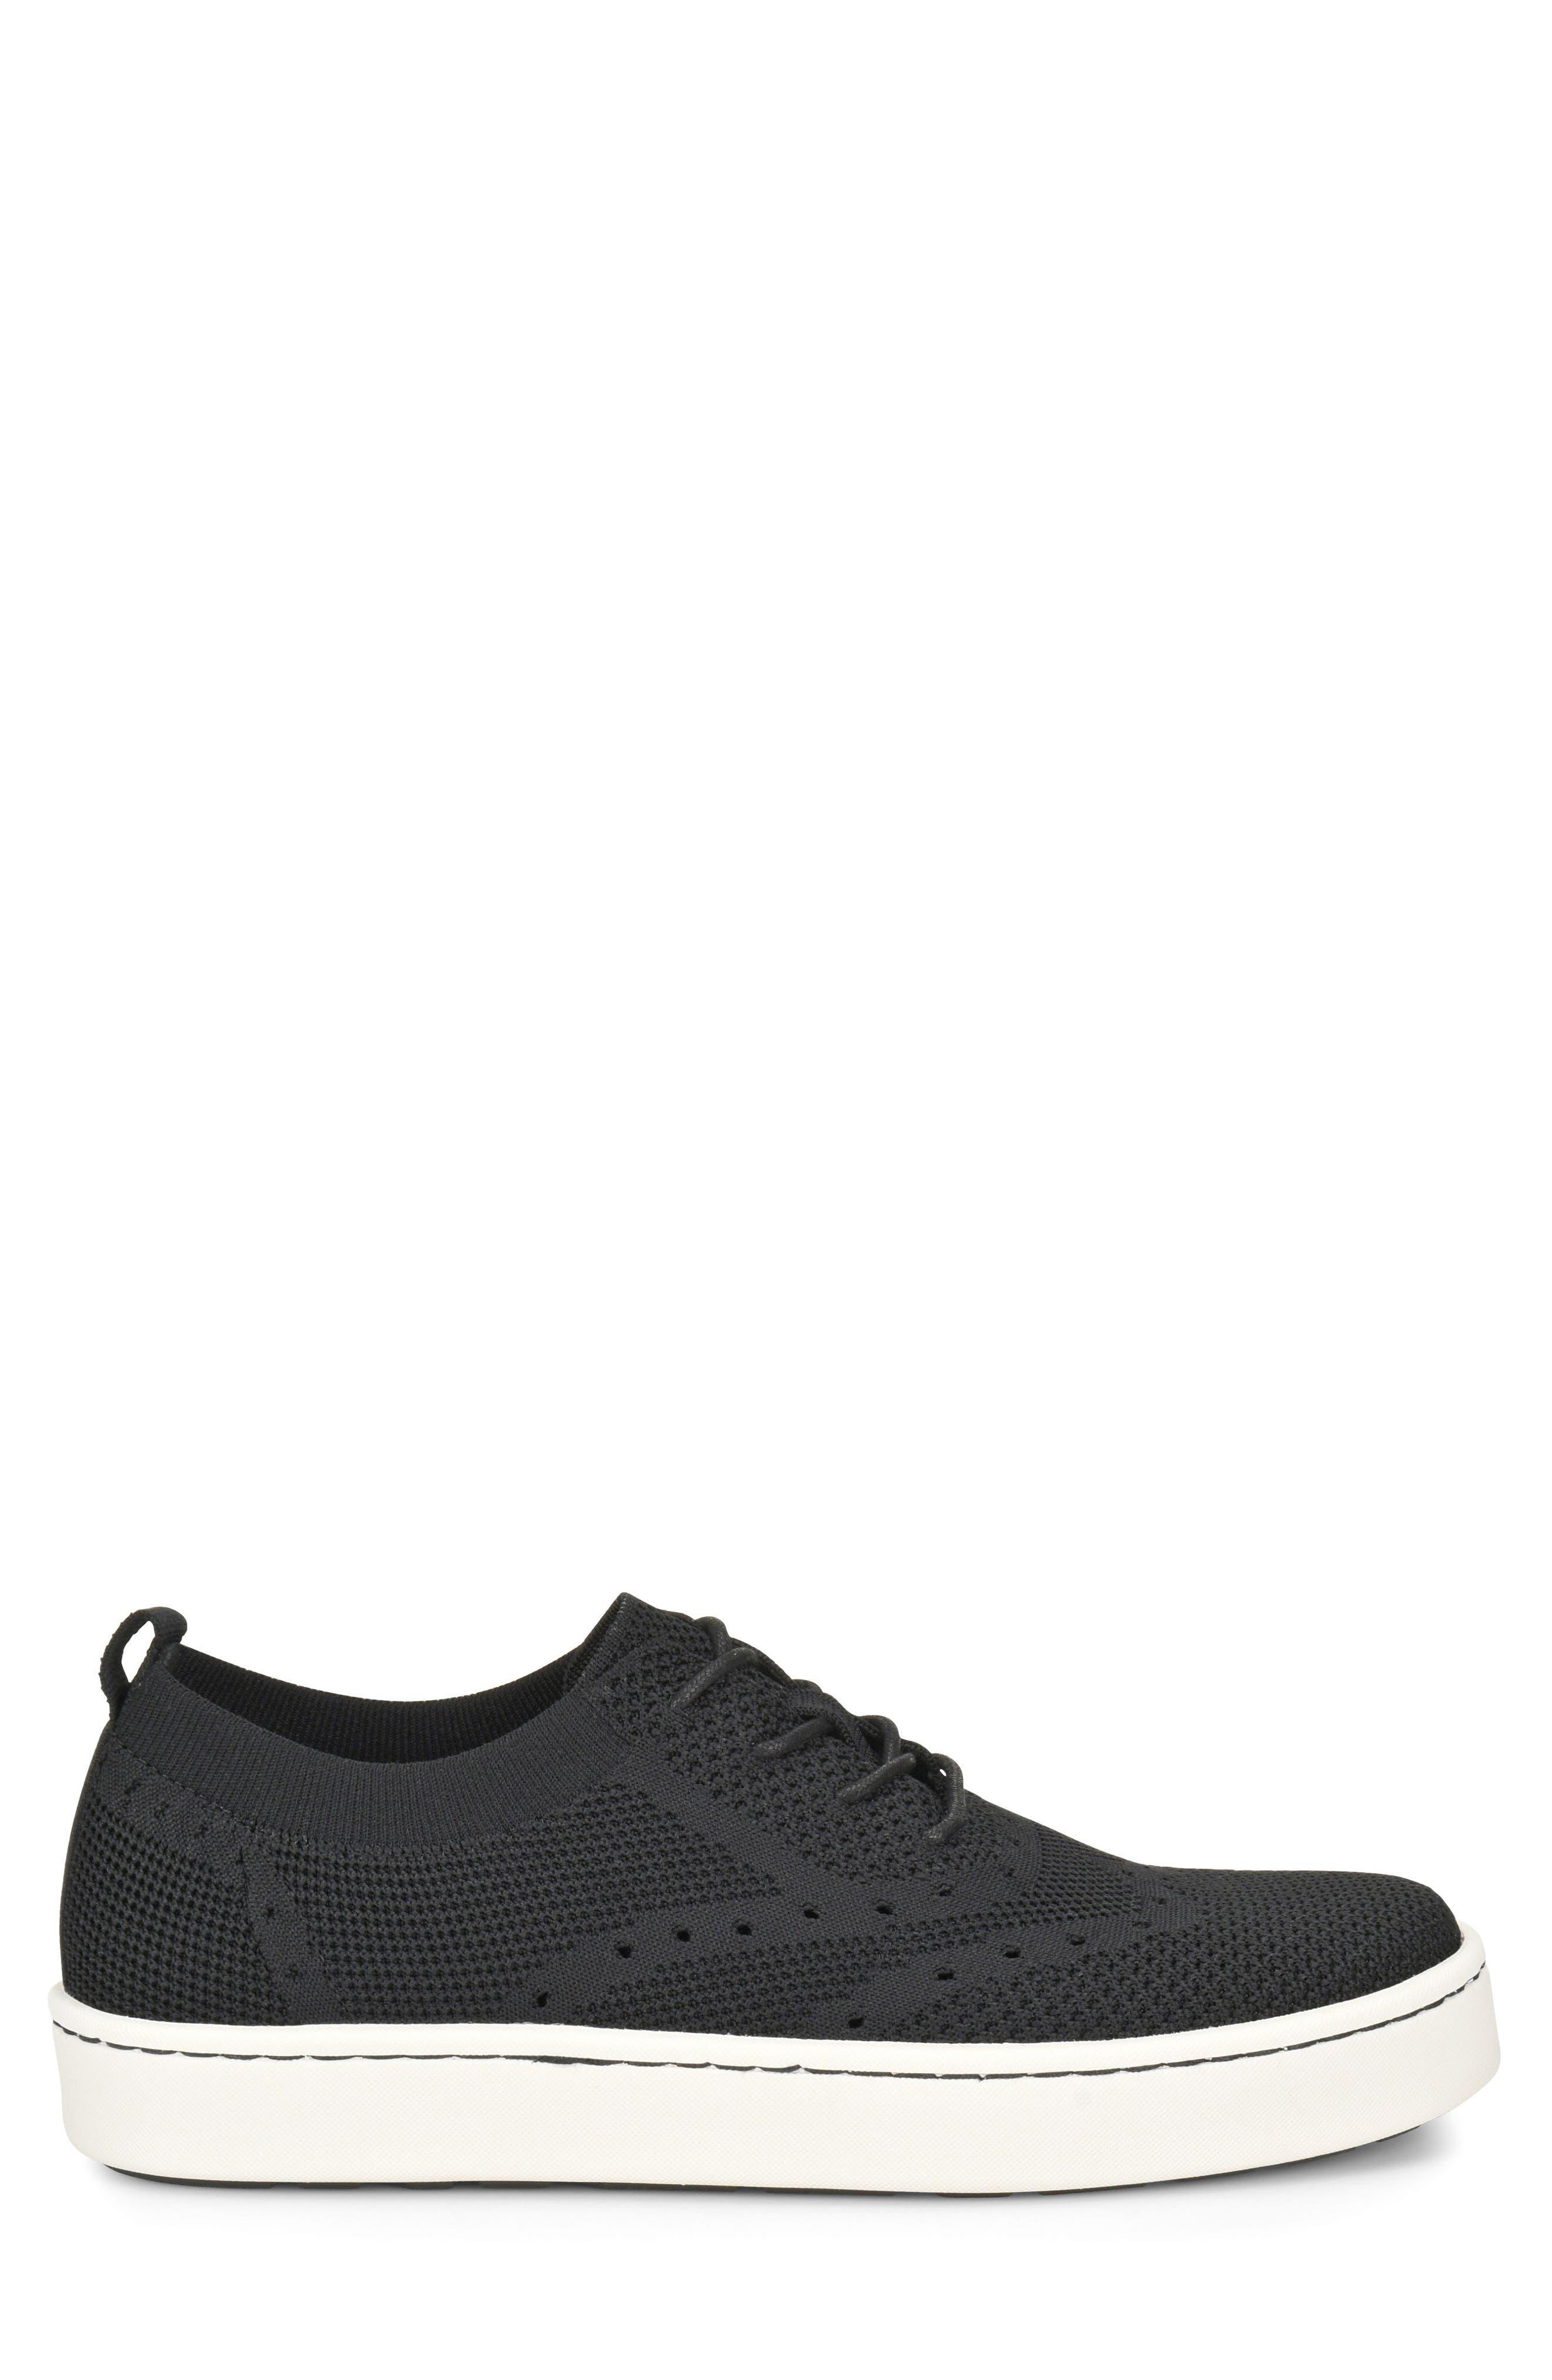 Bearse Sneaker,                             Alternate thumbnail 3, color,                             001